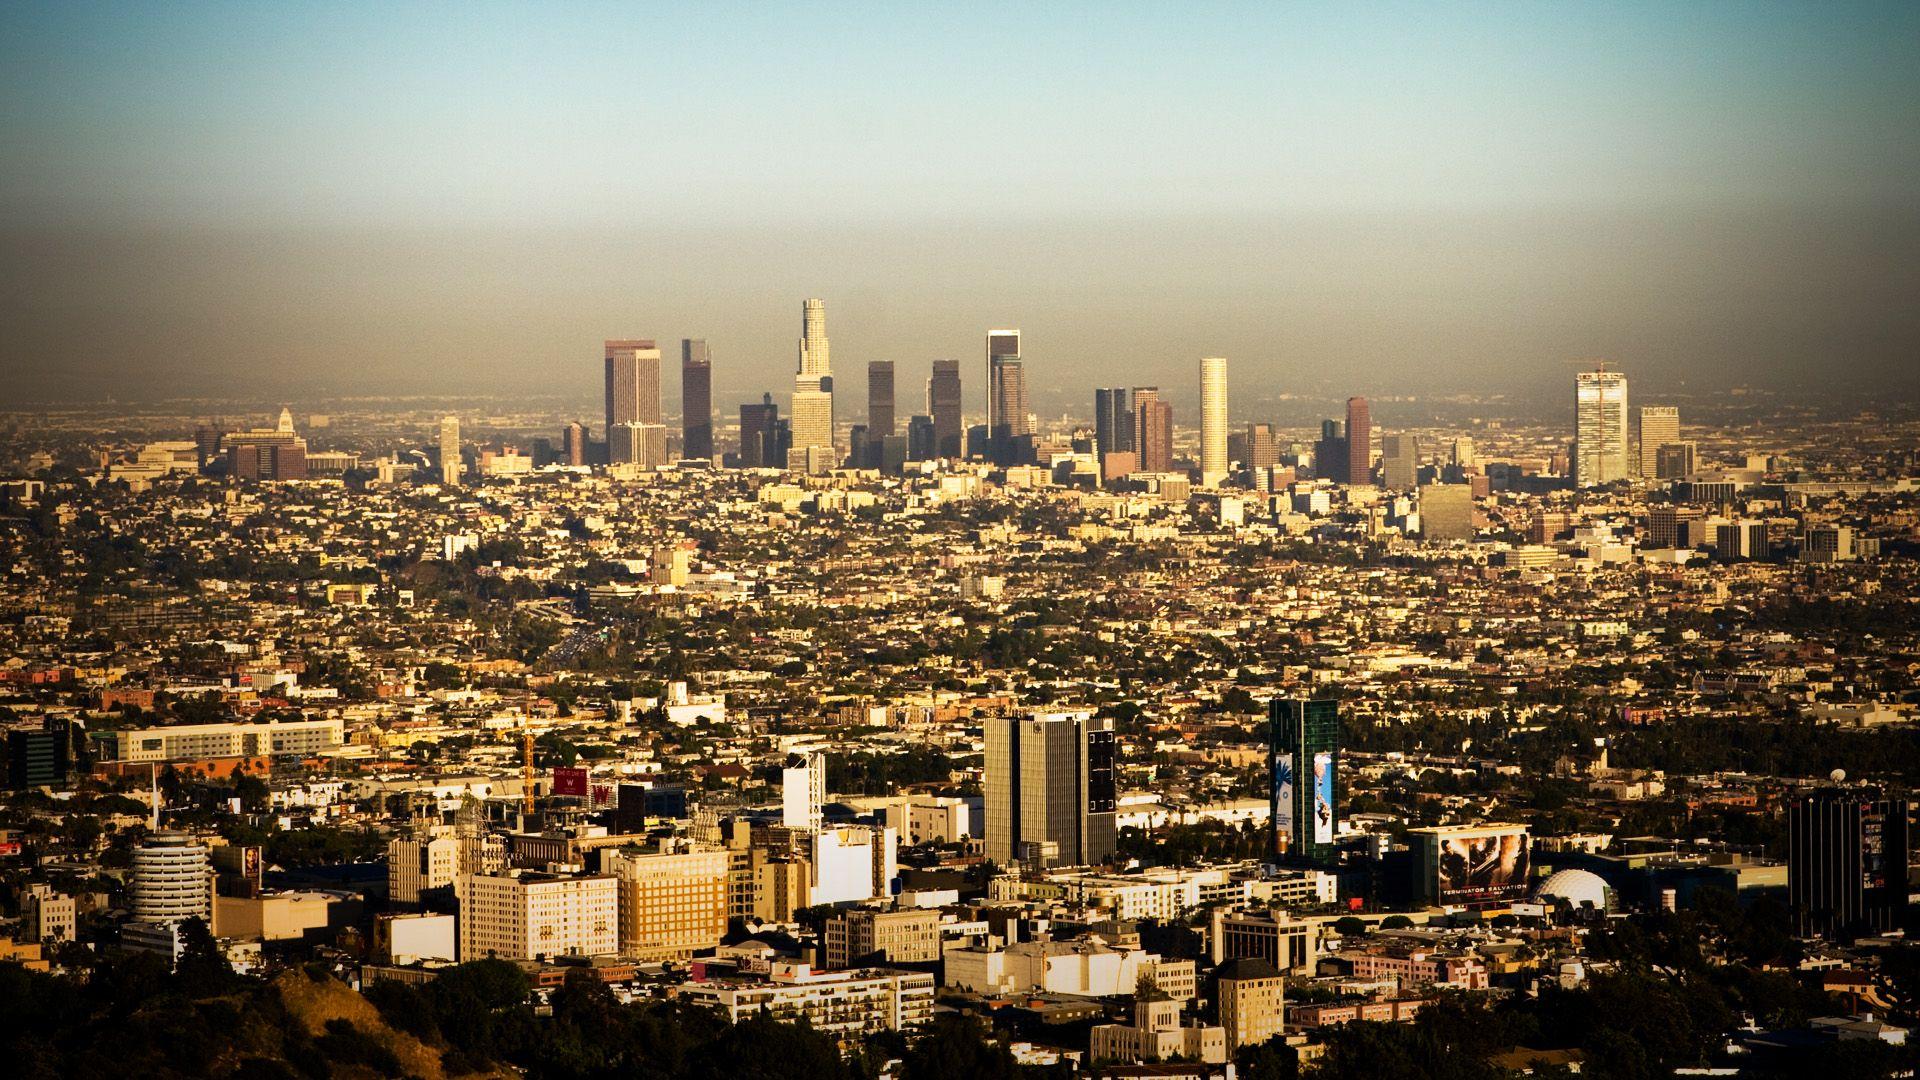 Downtown La Wallpaper 1920x1080 Jpg 1920 1080 Los Angeles Wallpaper Los Angeles Hotels Los Angeles City